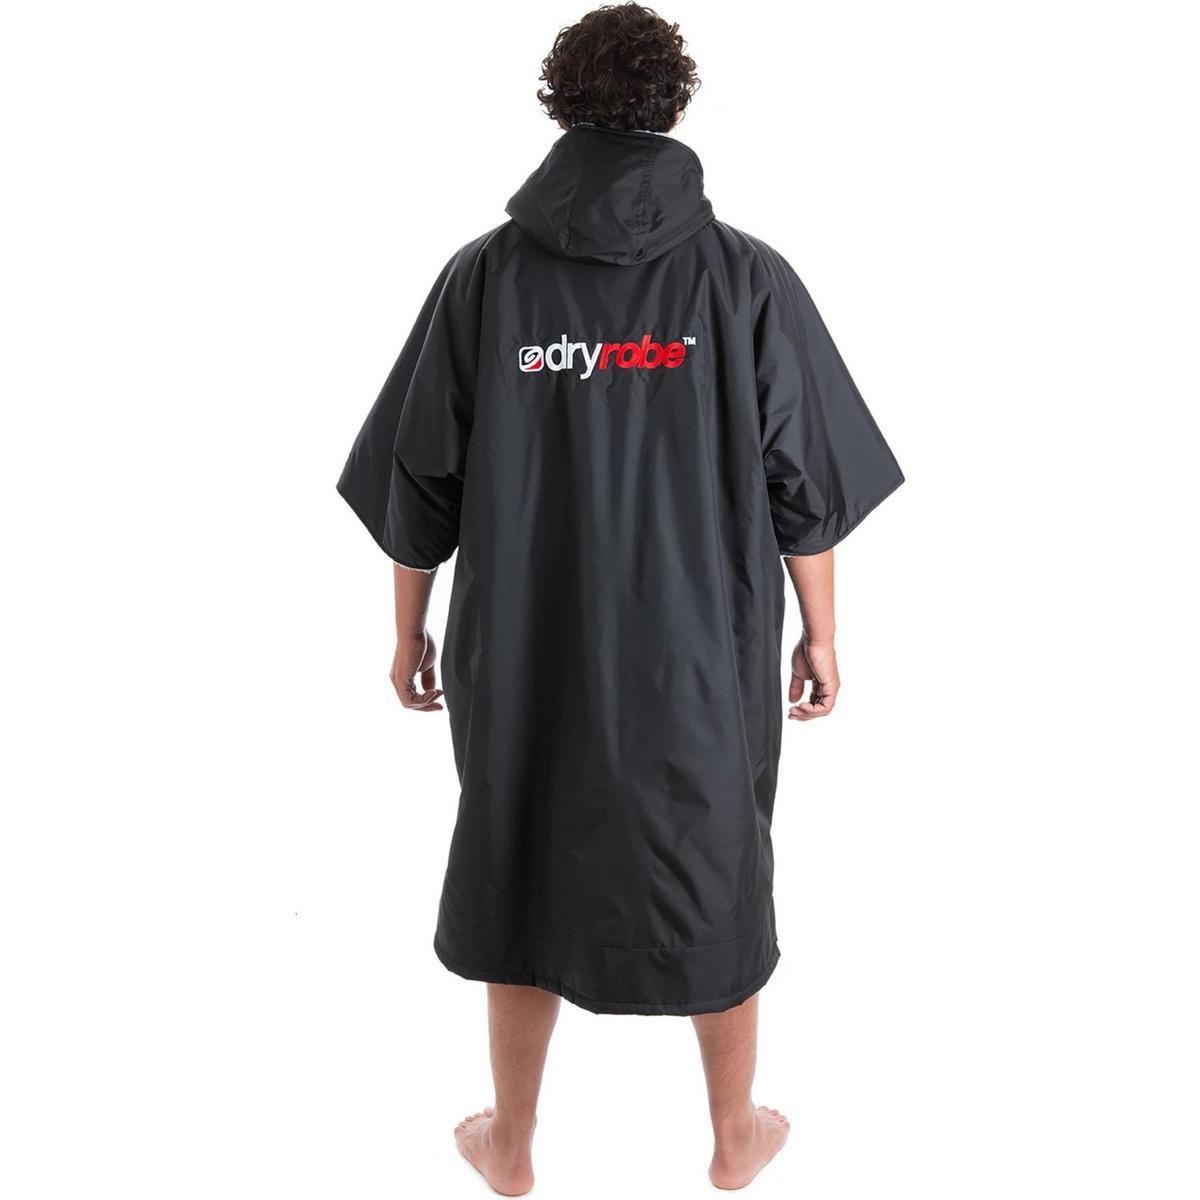 Dry Robe Advance Short Sleeve - Black/Grey